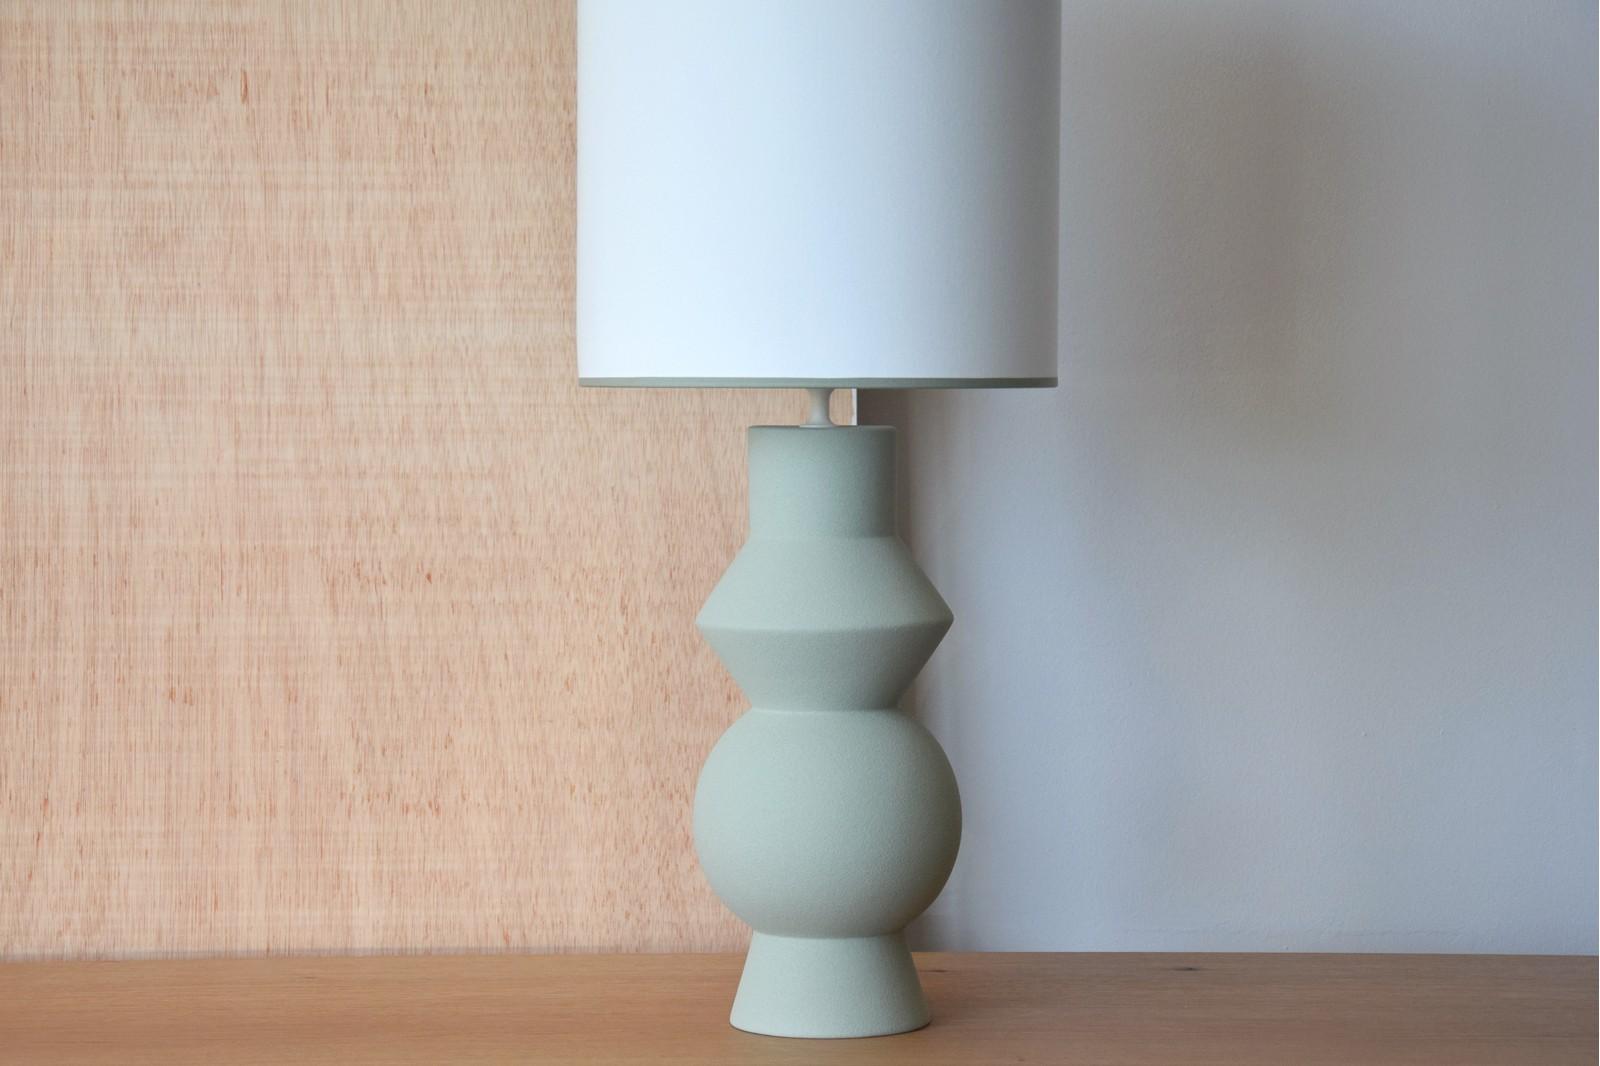 CERAMIC LAMP FORMA MOSS COLOR